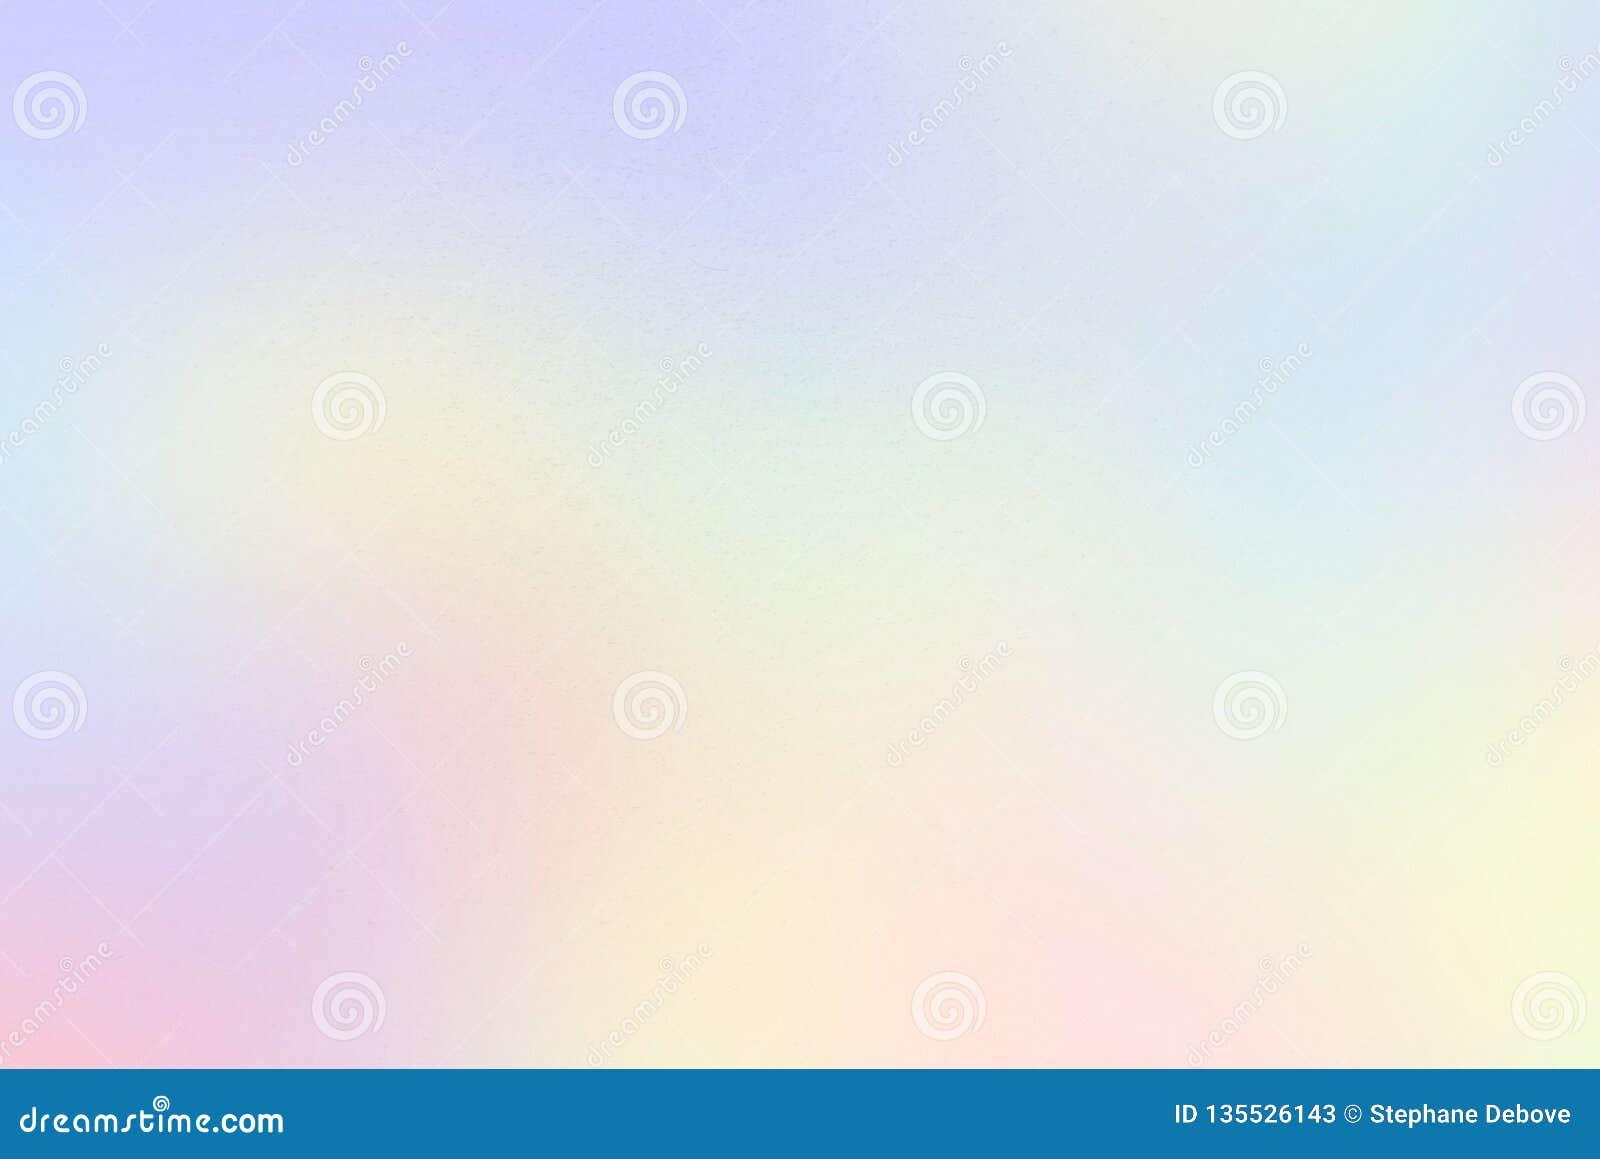 Rainbow Pastel gradient wallpaper background with Pastel Yellow, Maximum Blue Purple, Pale Cyan, Tulip, Melon, Magic Mint colors, and watercolor paper ...